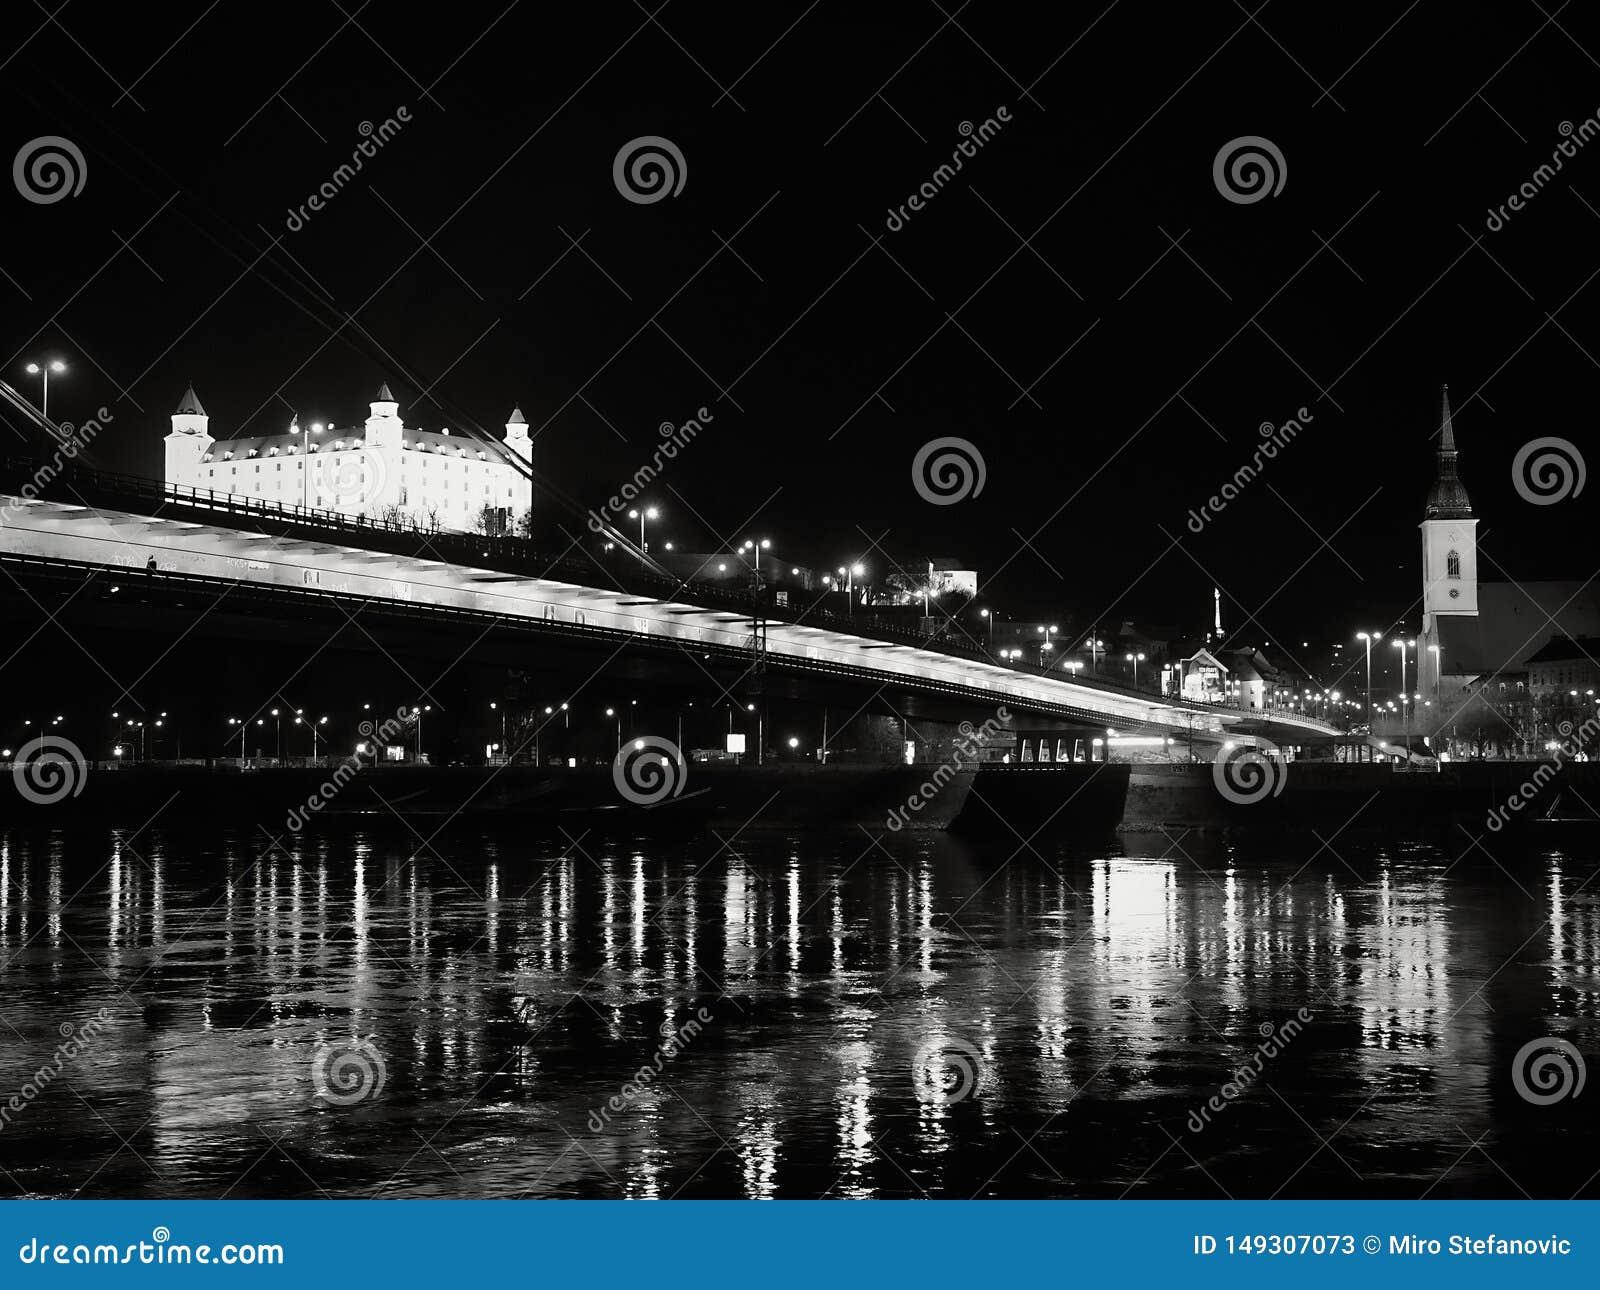 Bratislava- evening, nice view of the ciity